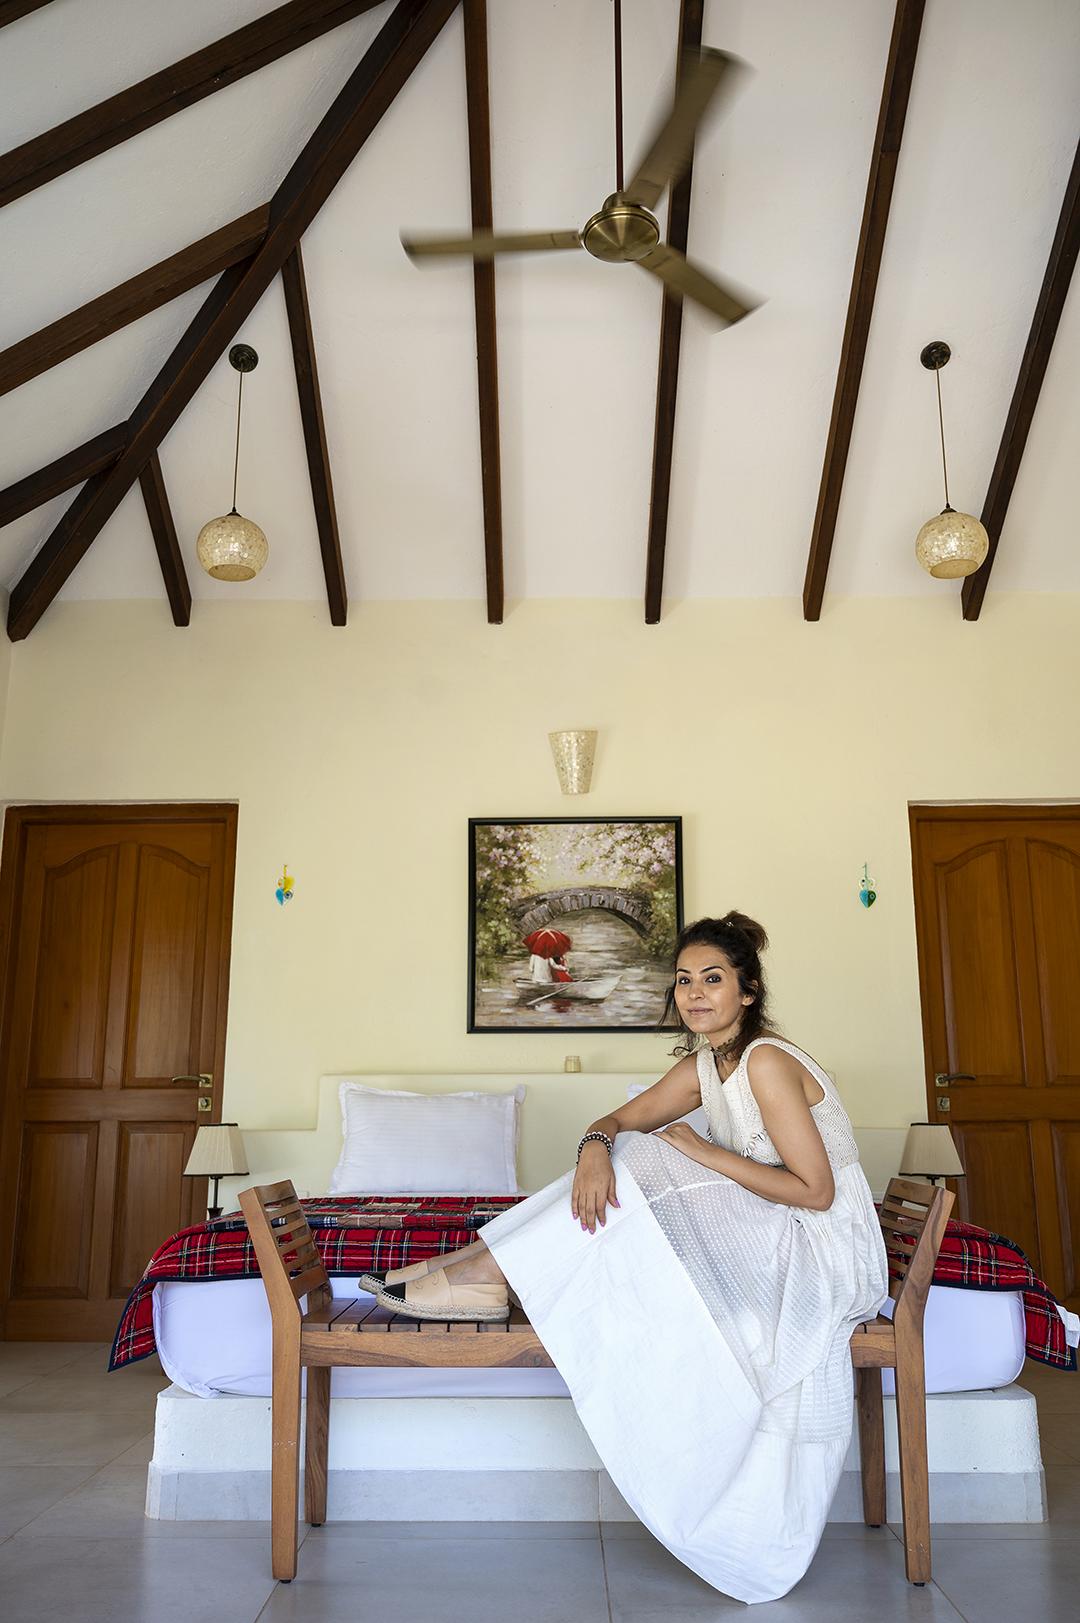 The master bedroom at Casa De Amor